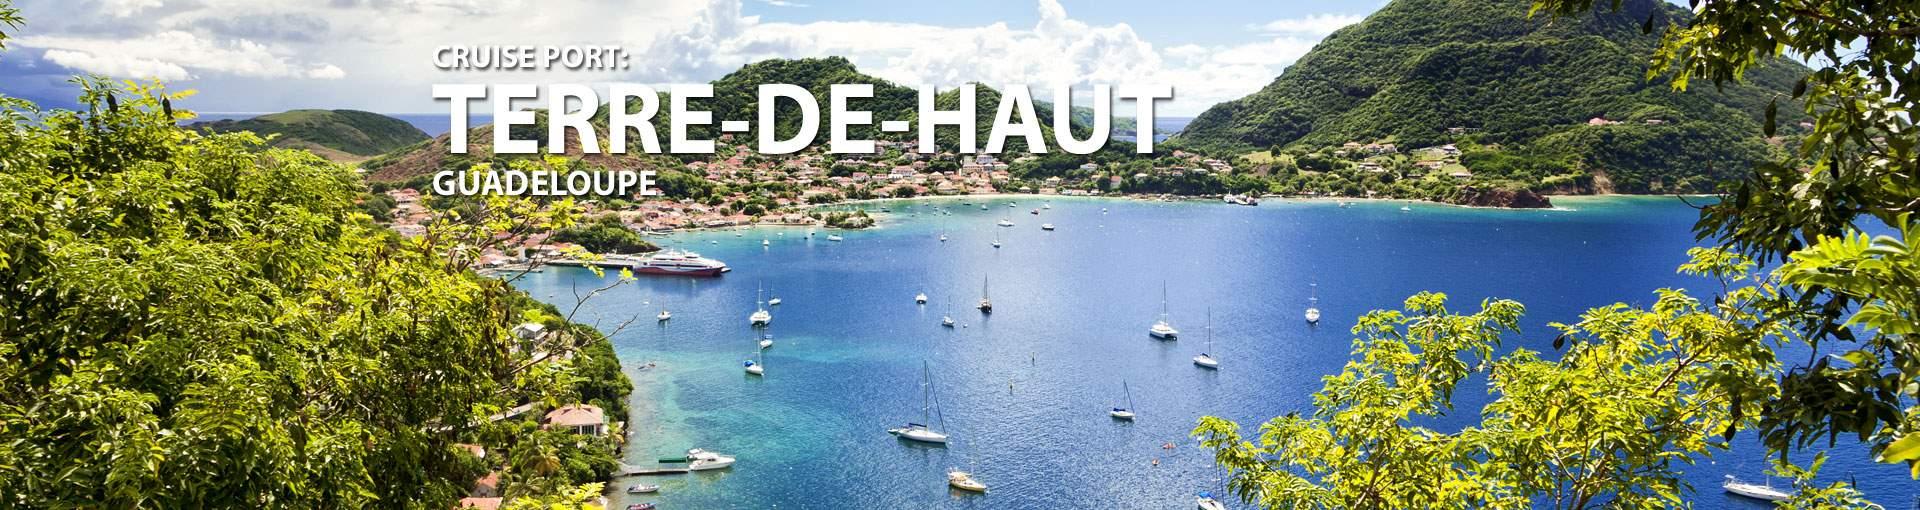 Cruises to Terre-De-Haut, Guadeloupe